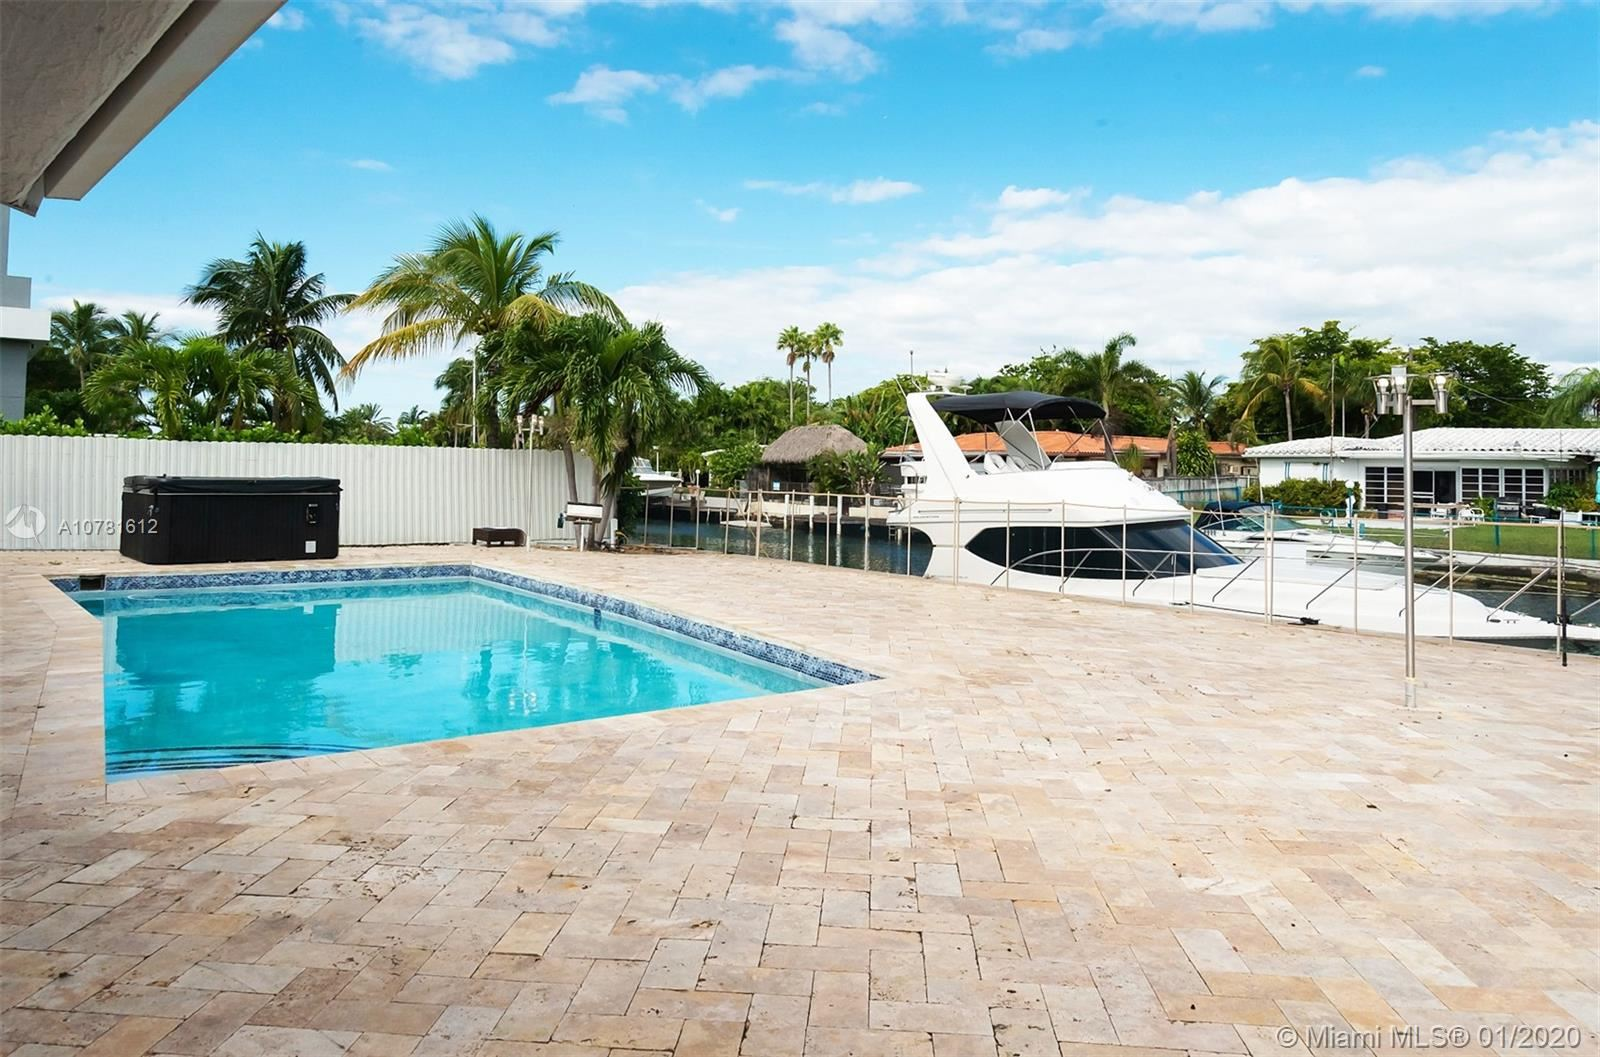 Photo for 2055 Keystone Blvd, North Miami, FL 33181 (MLS # A10781612)